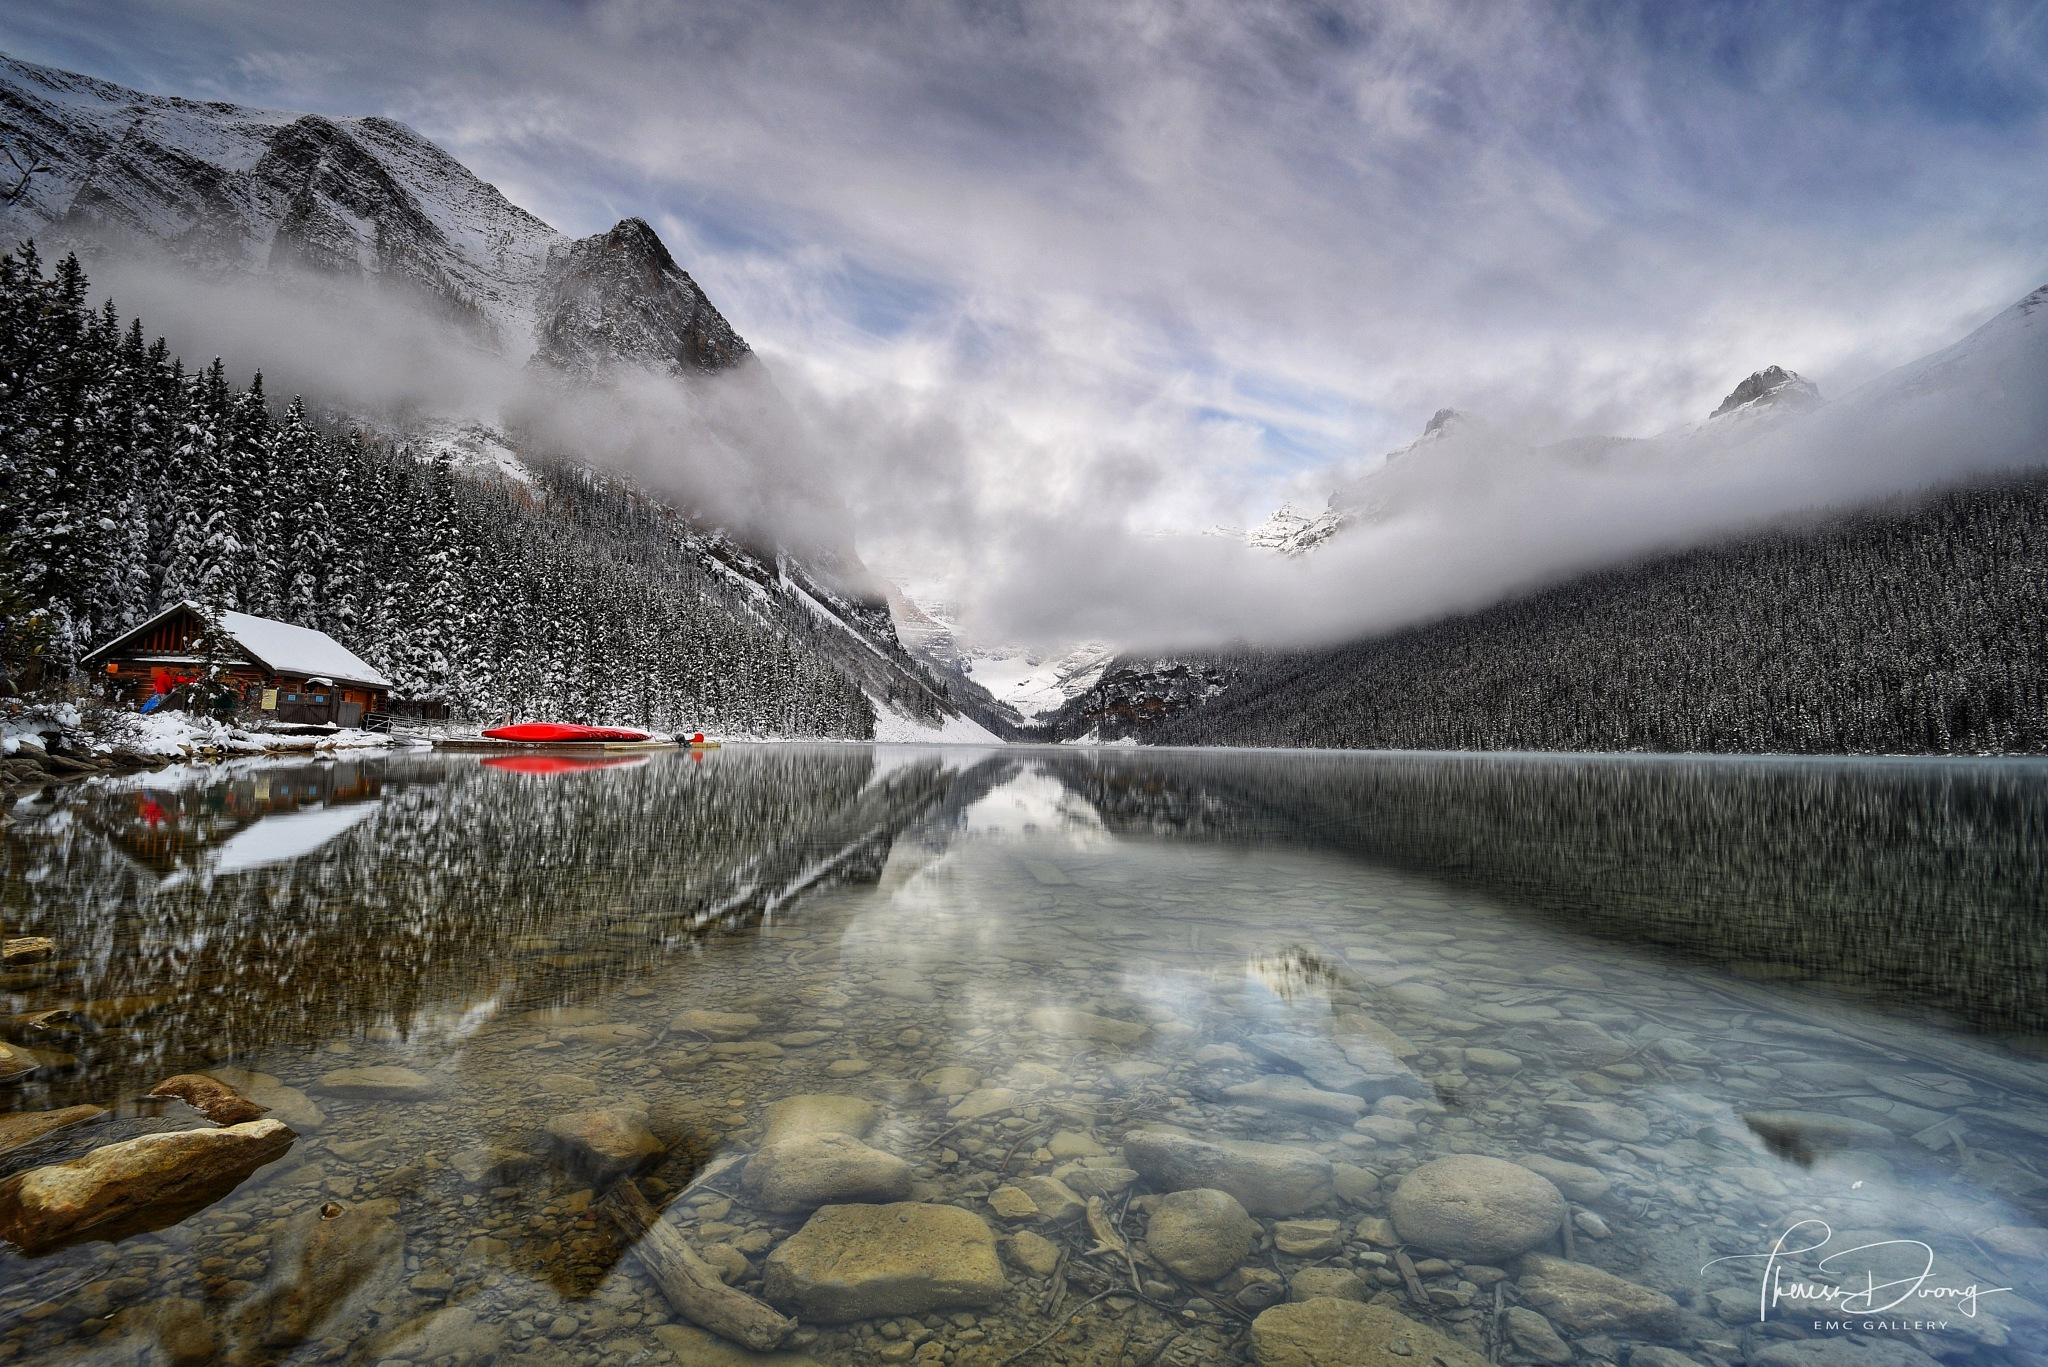 Lake Louise, Banff National Park by Theresa Duong